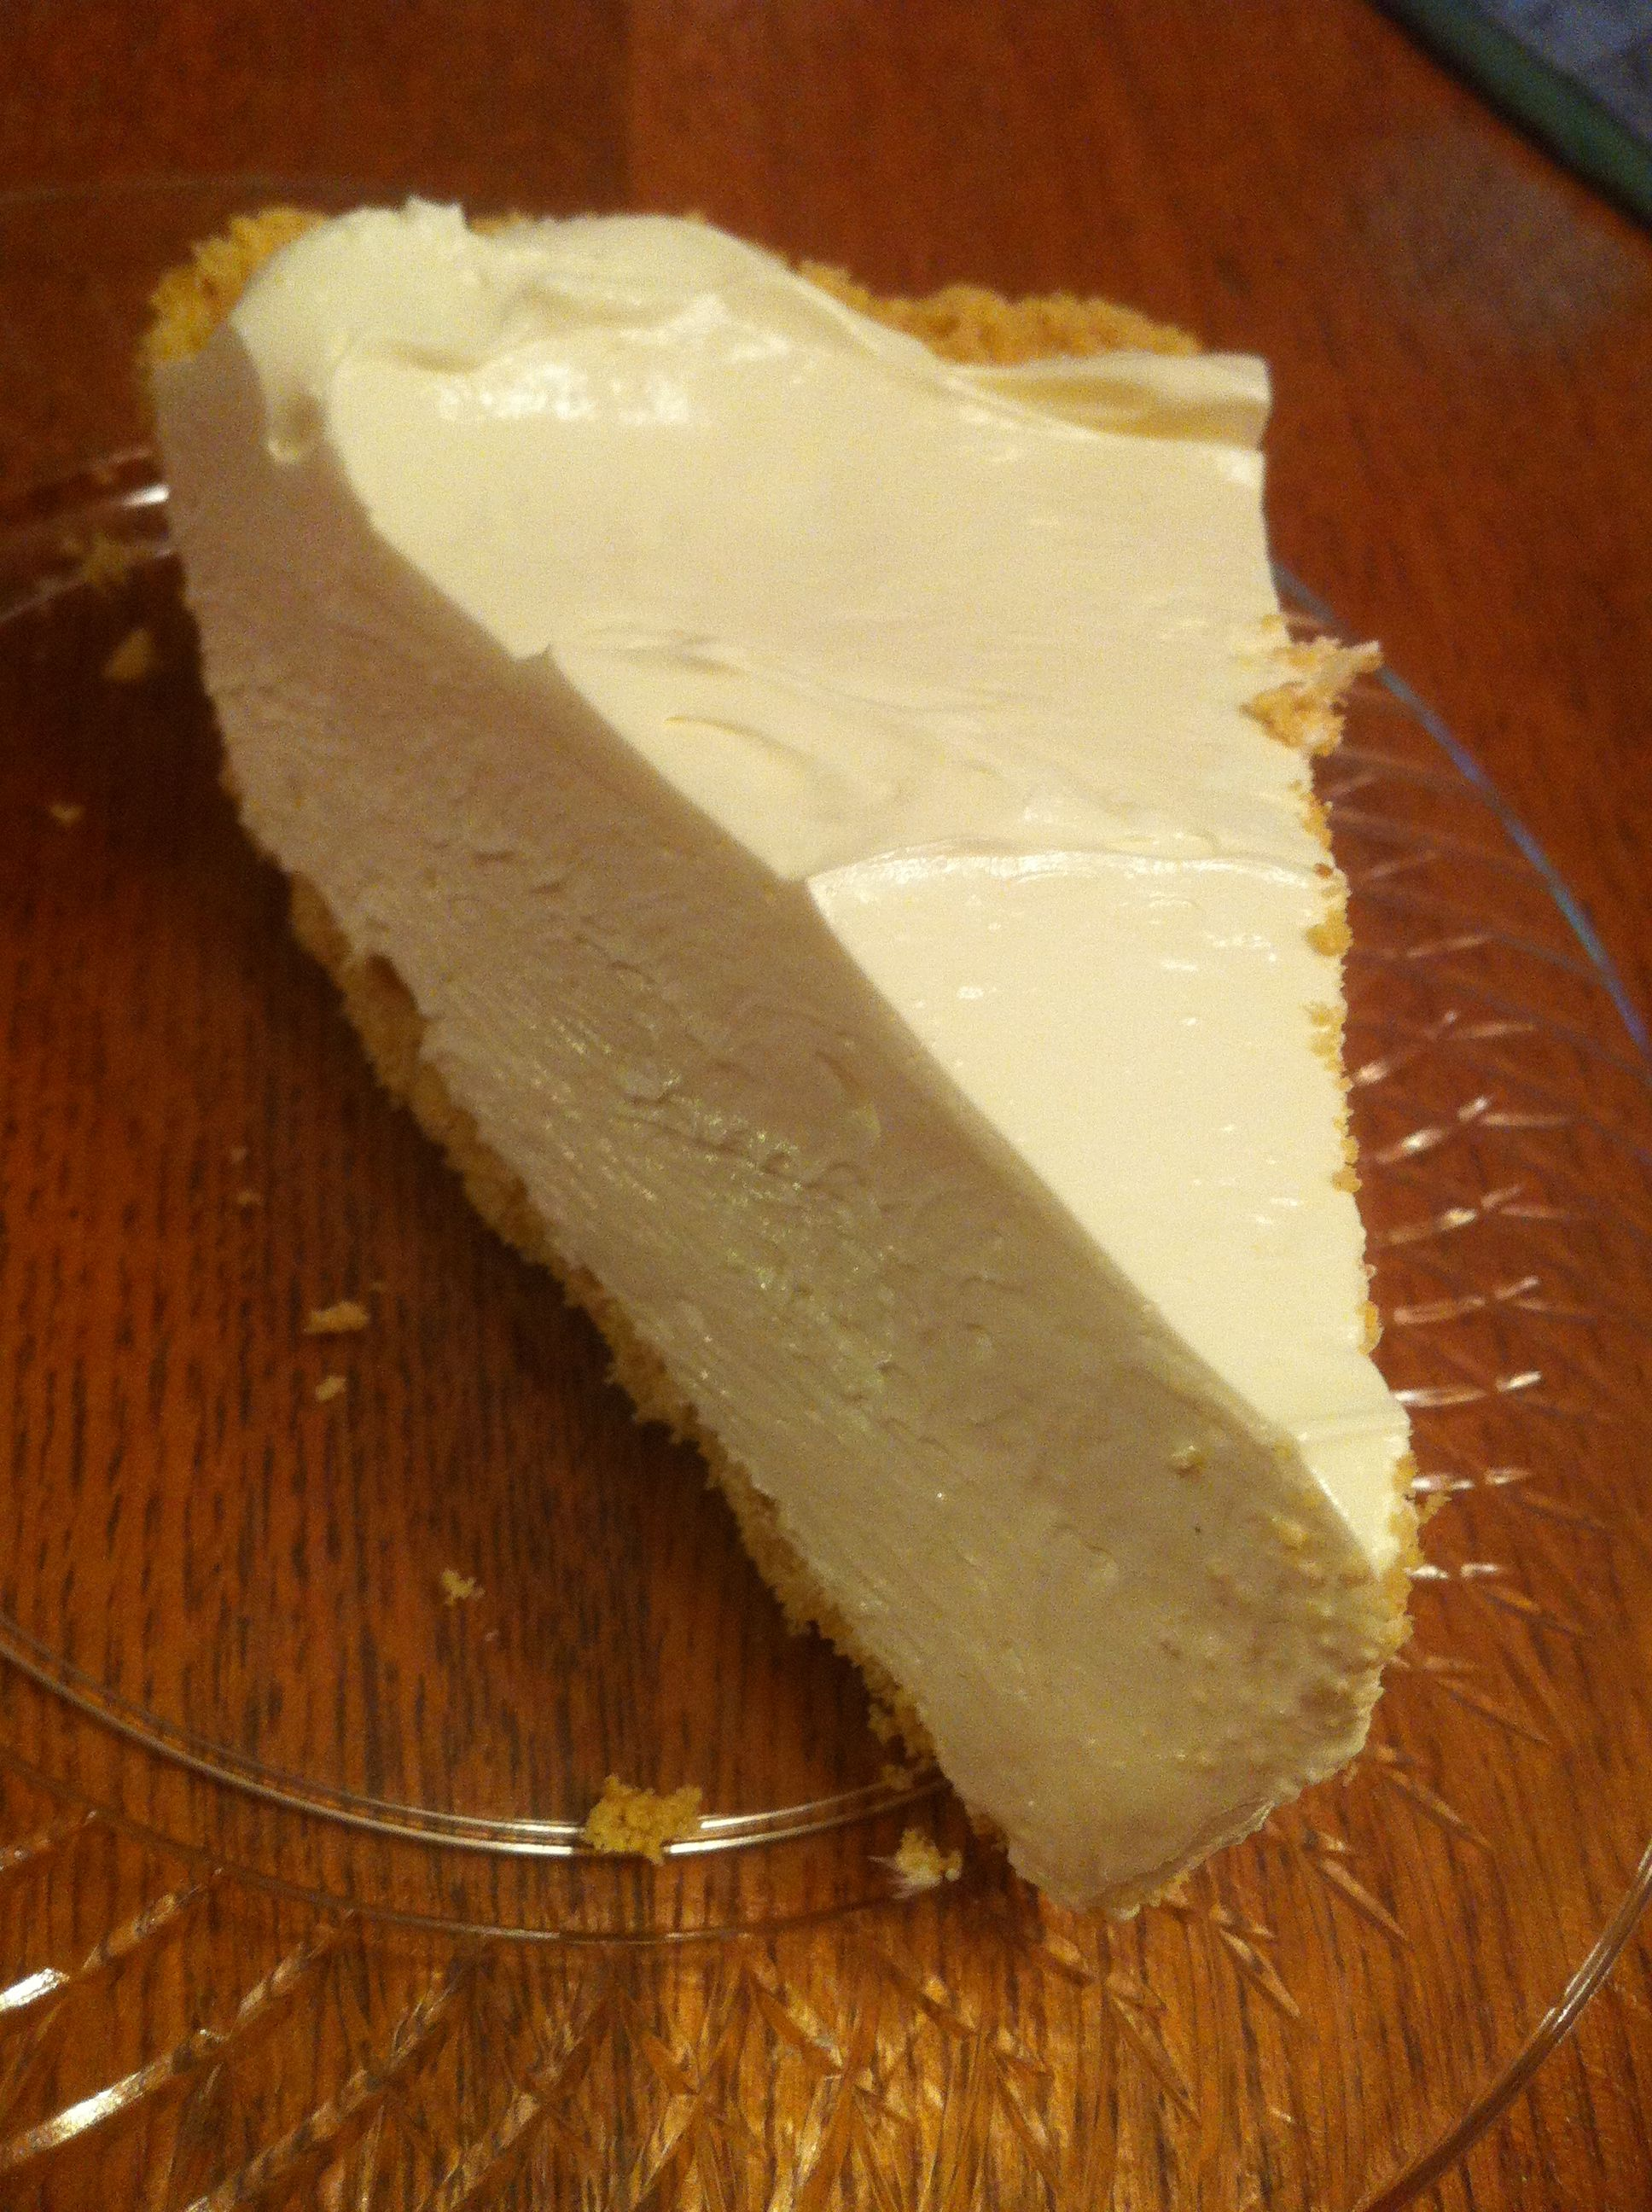 1 8 oz. tub Cool Whip  1 can sweetened condensed milk  1 pkg Kool-Aid (any flavor)  1 Graham Cracker Pie Crust